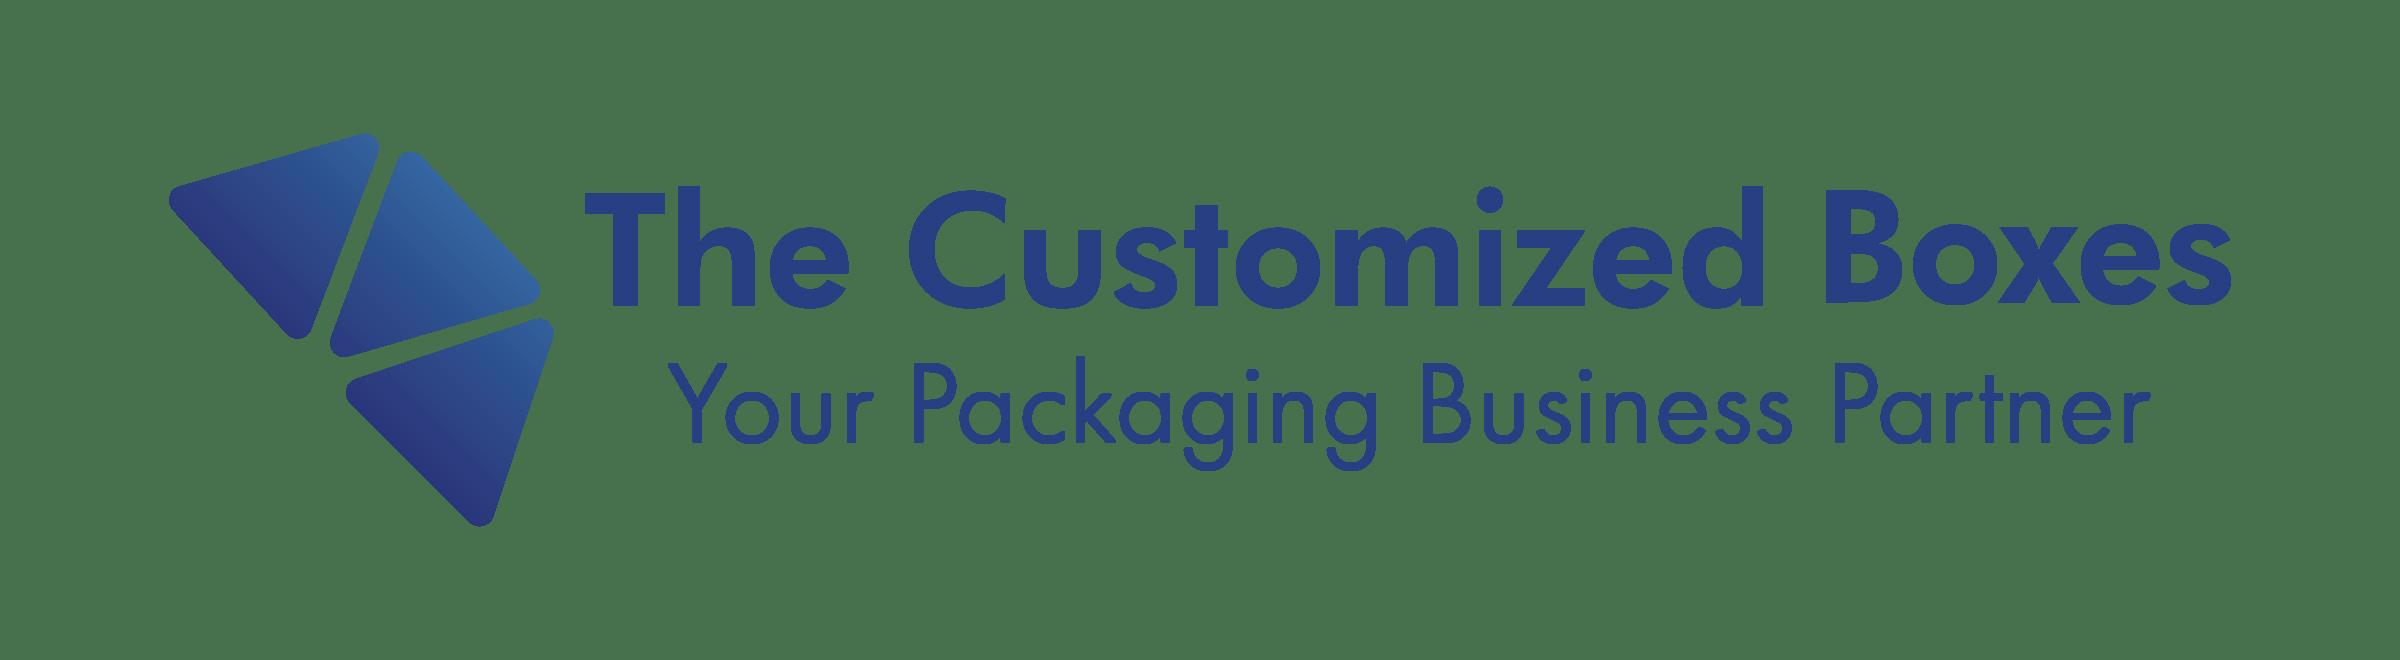 The Customized Boxes Logo